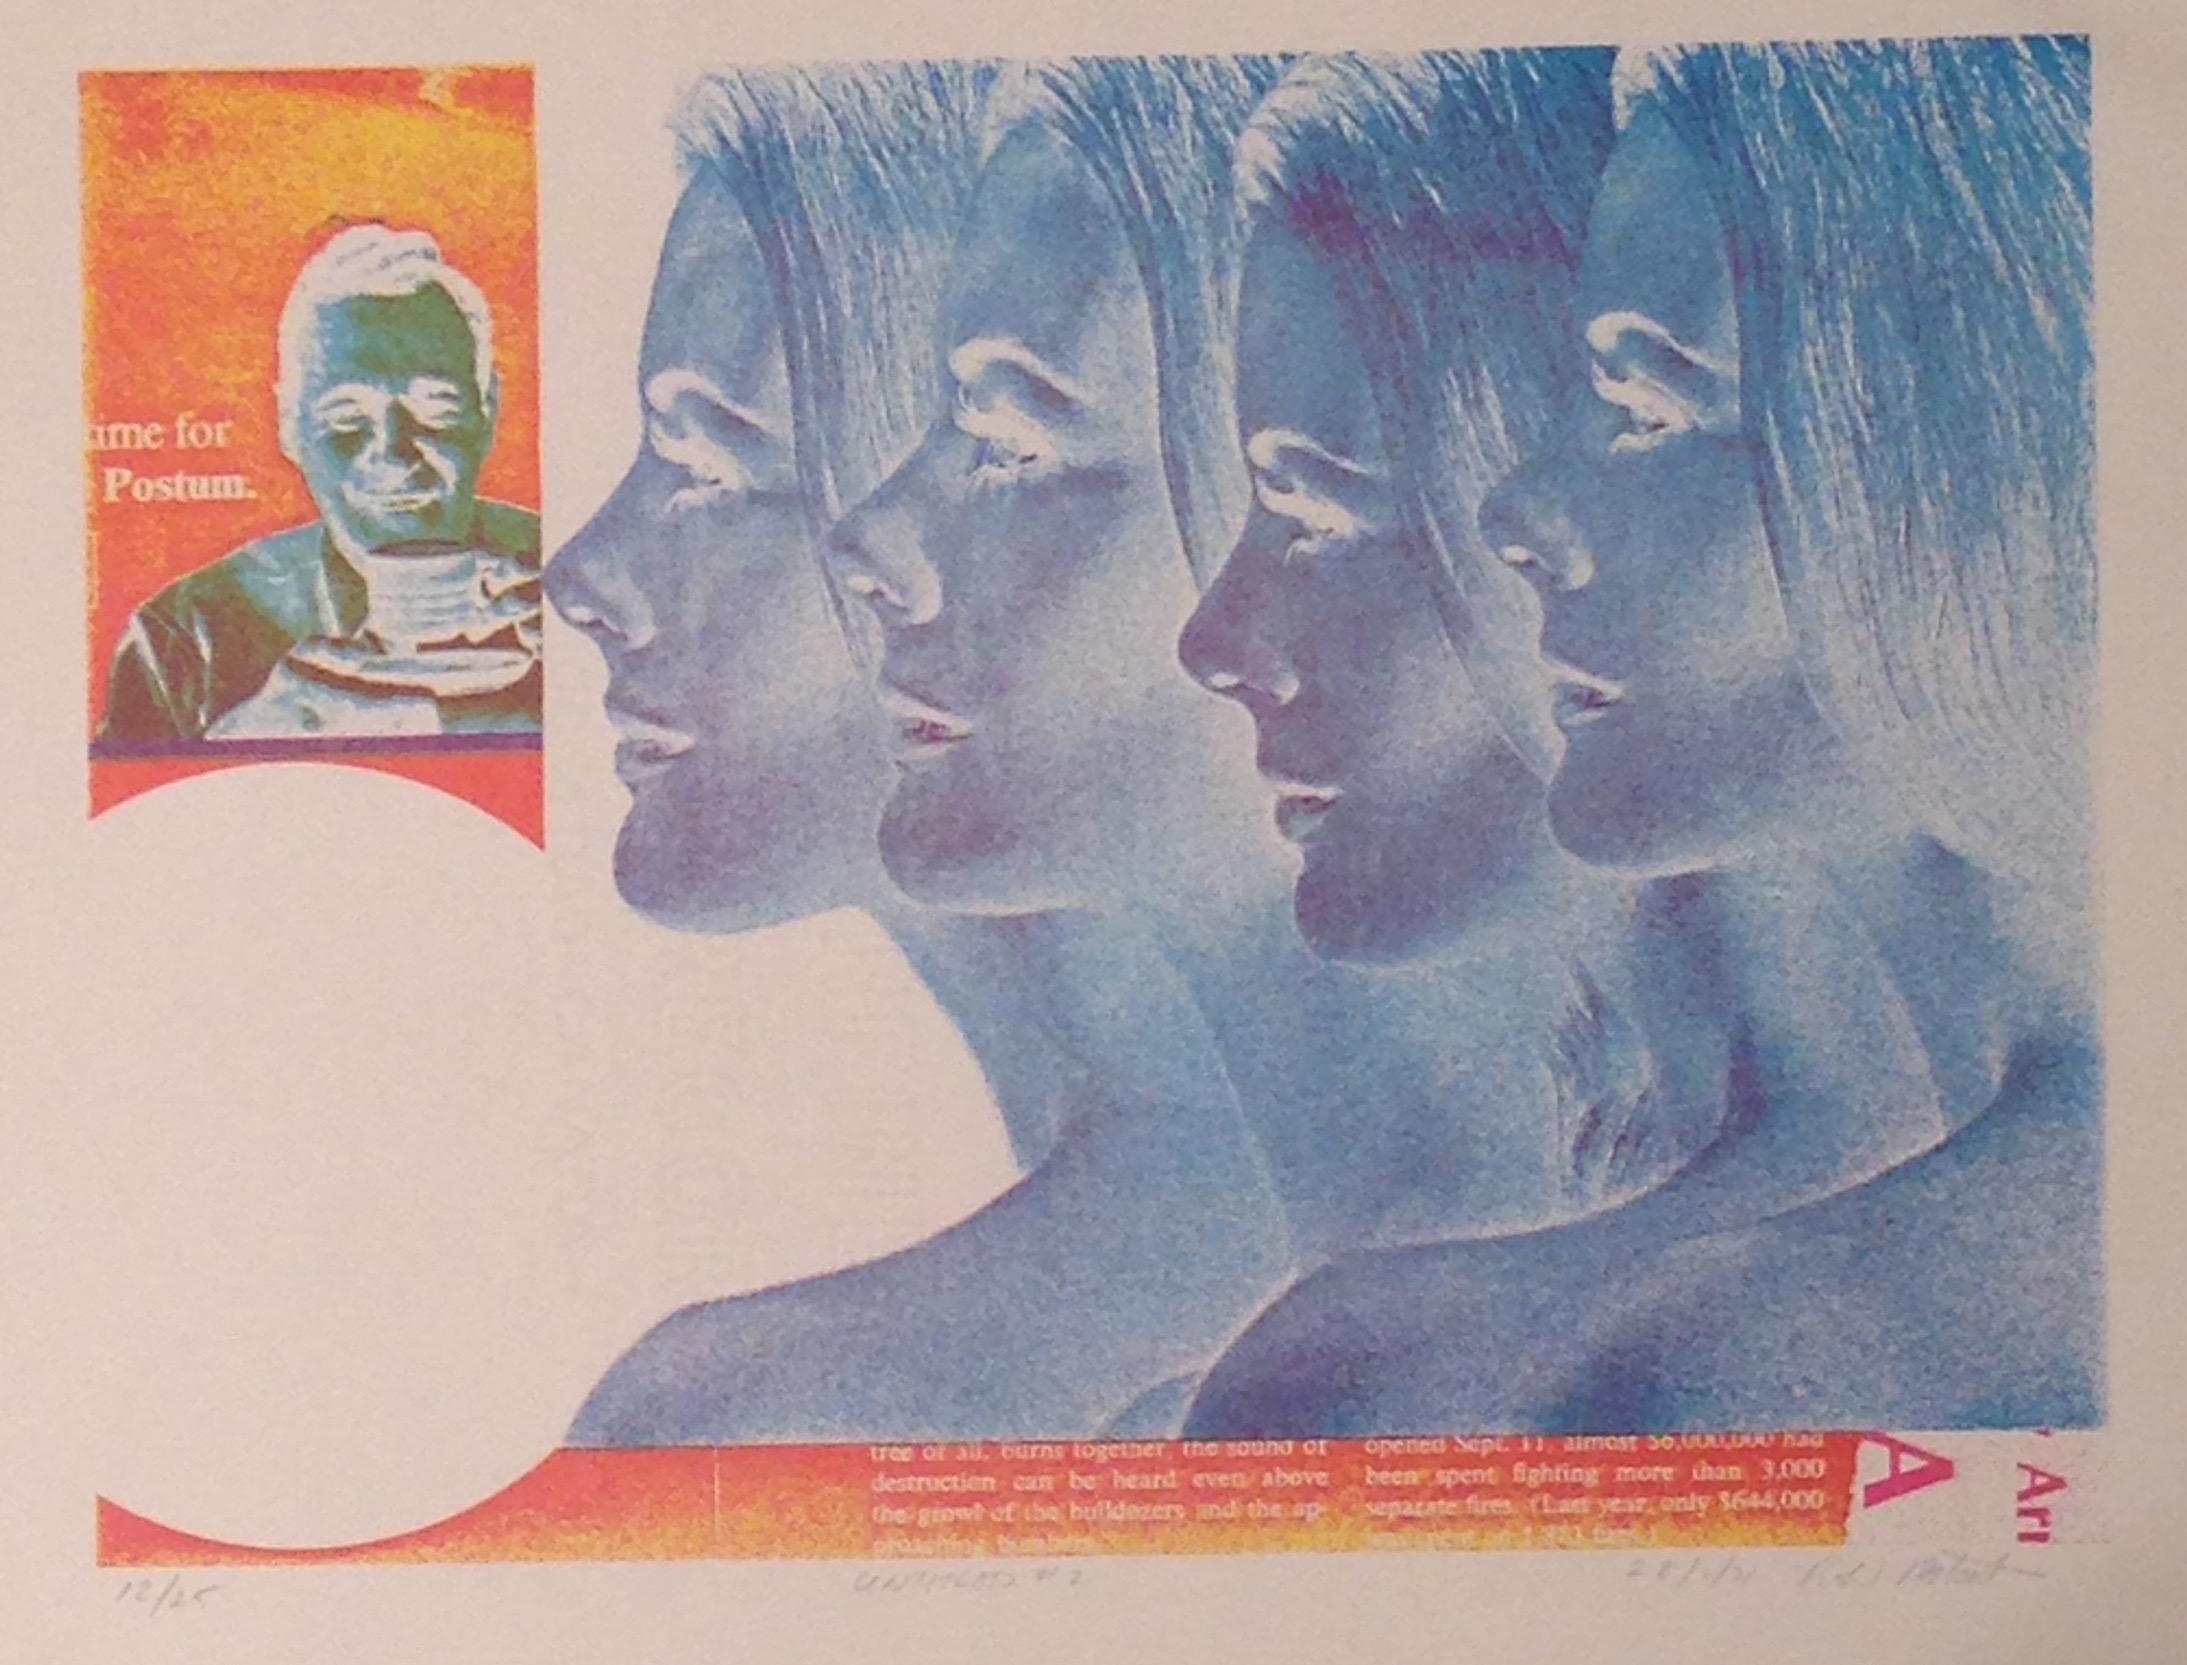 Wayne Eastcott, Untitled #2, 1971